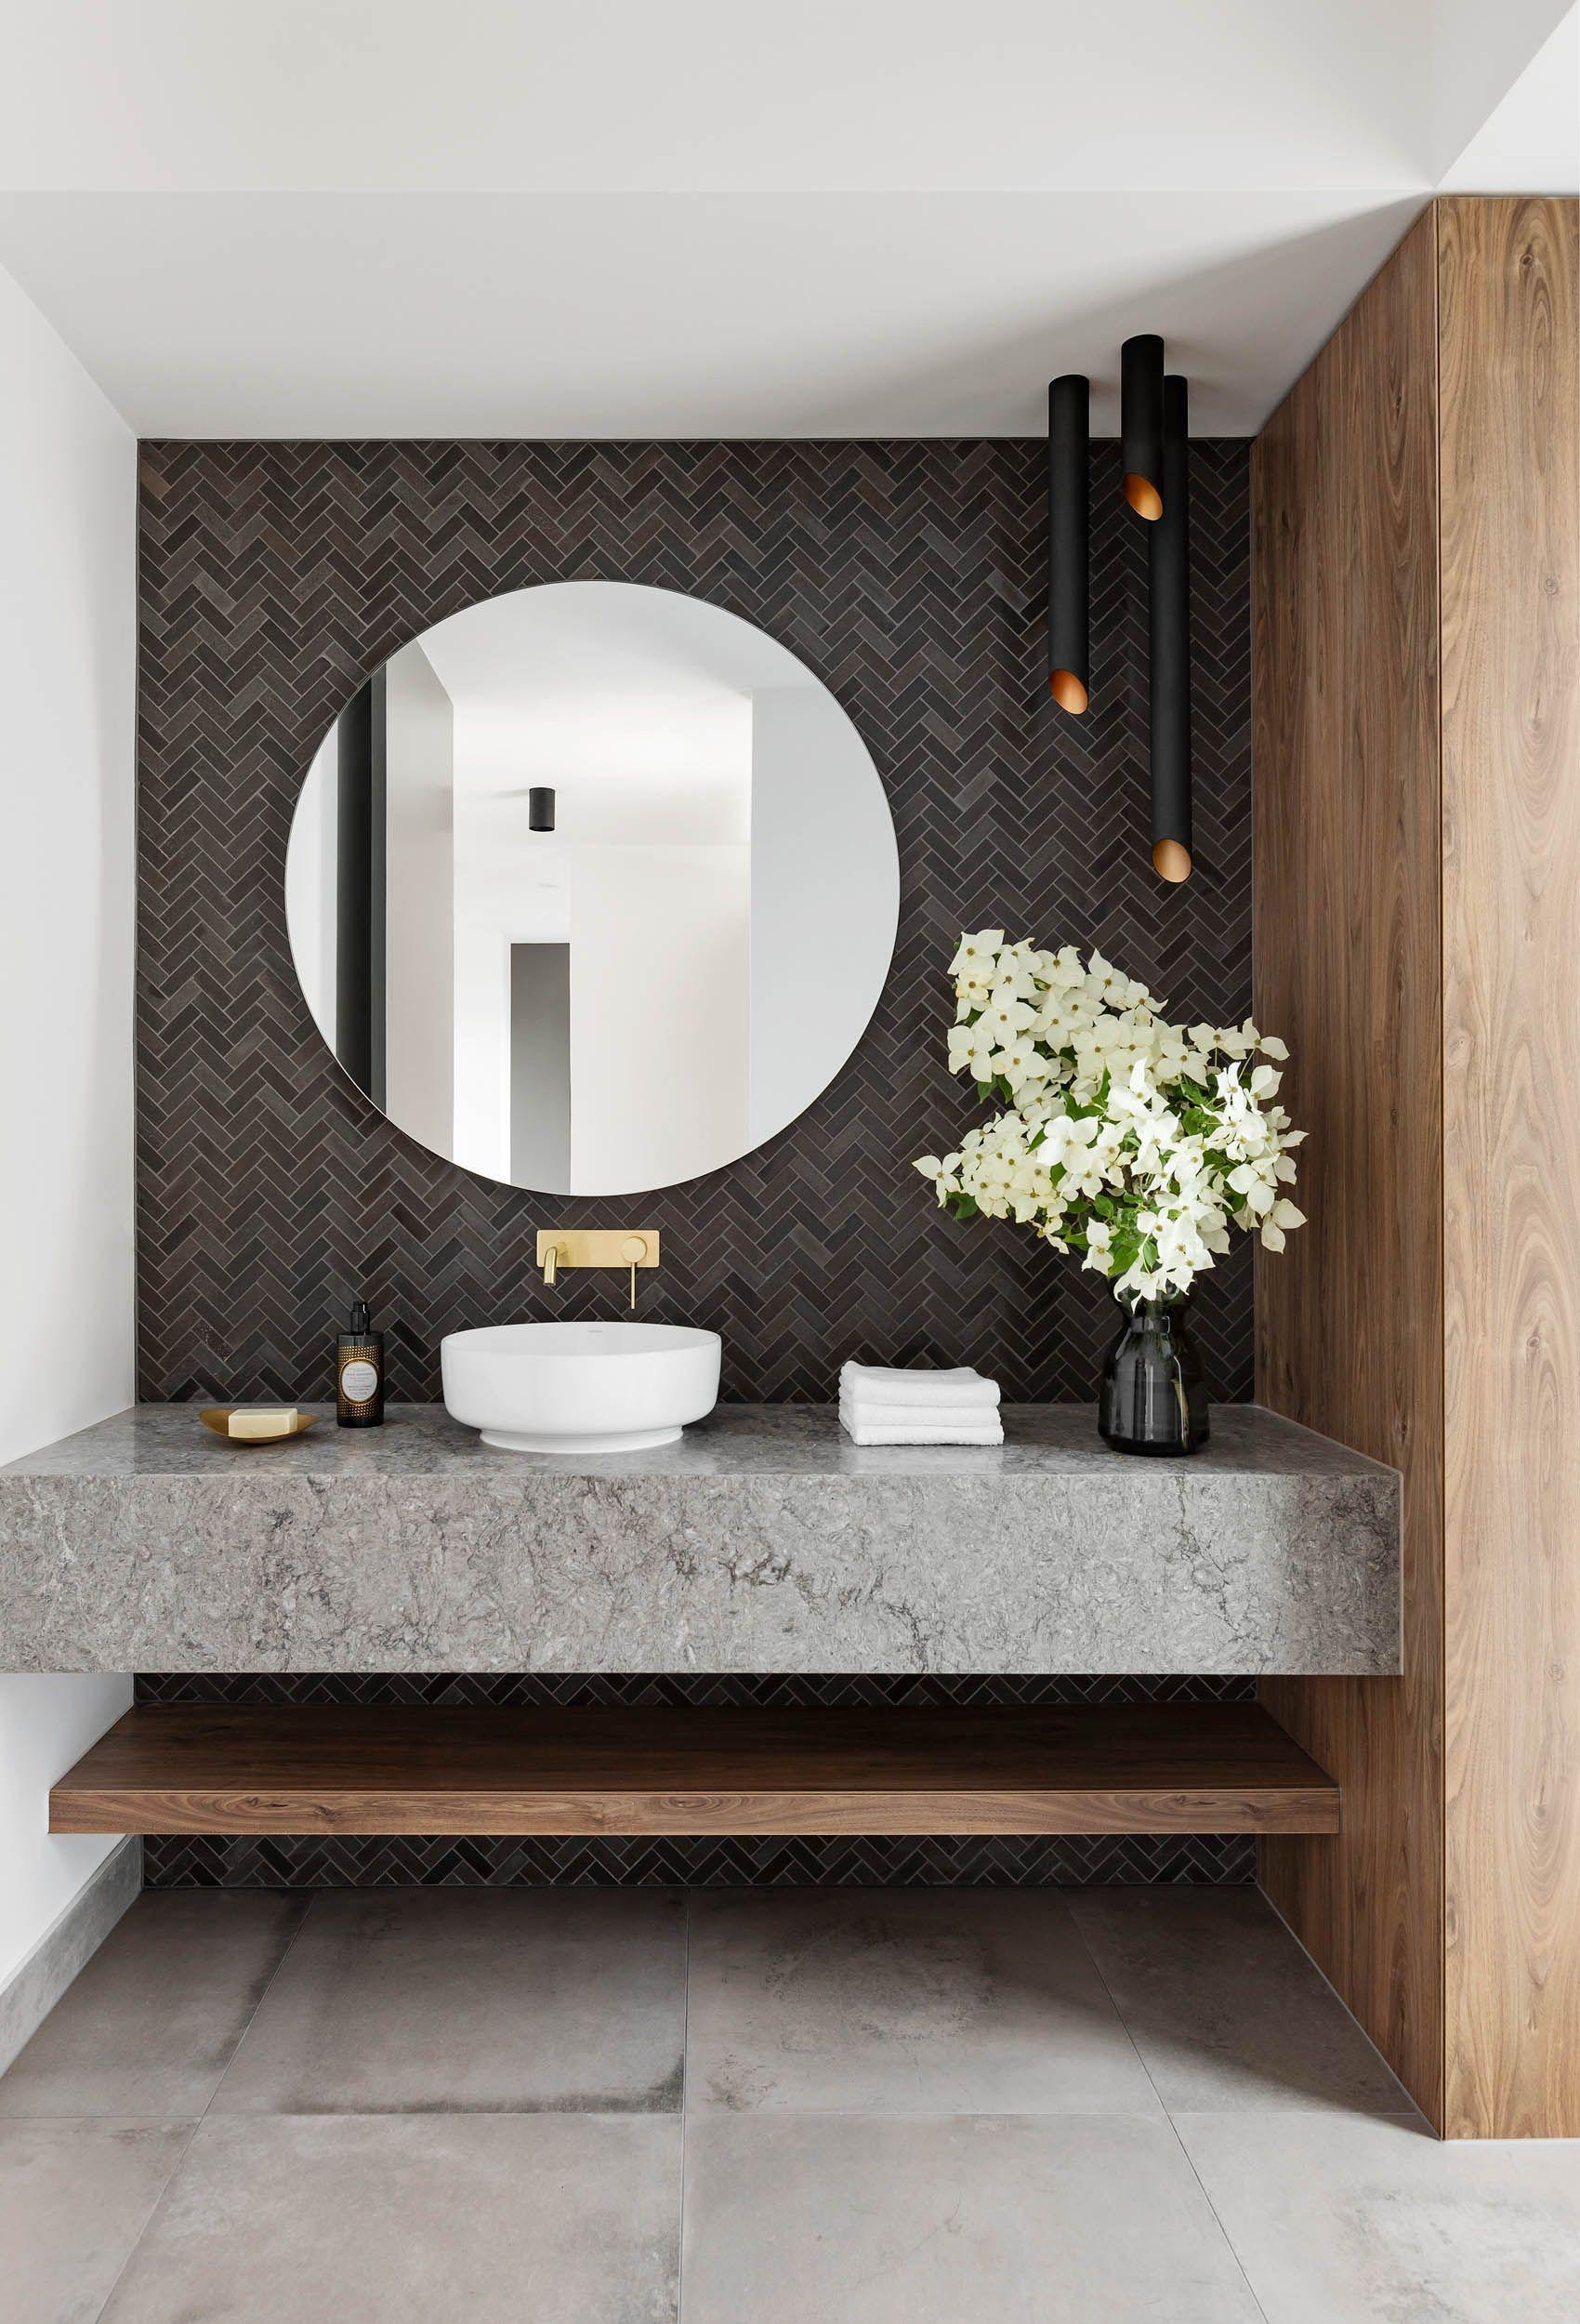 Discover More Amazing Interior Designs Interiordesign Design Inspiration Trends Interiordecoration De Badezimmer Design Badezimmerideen Luxus Badezimmer